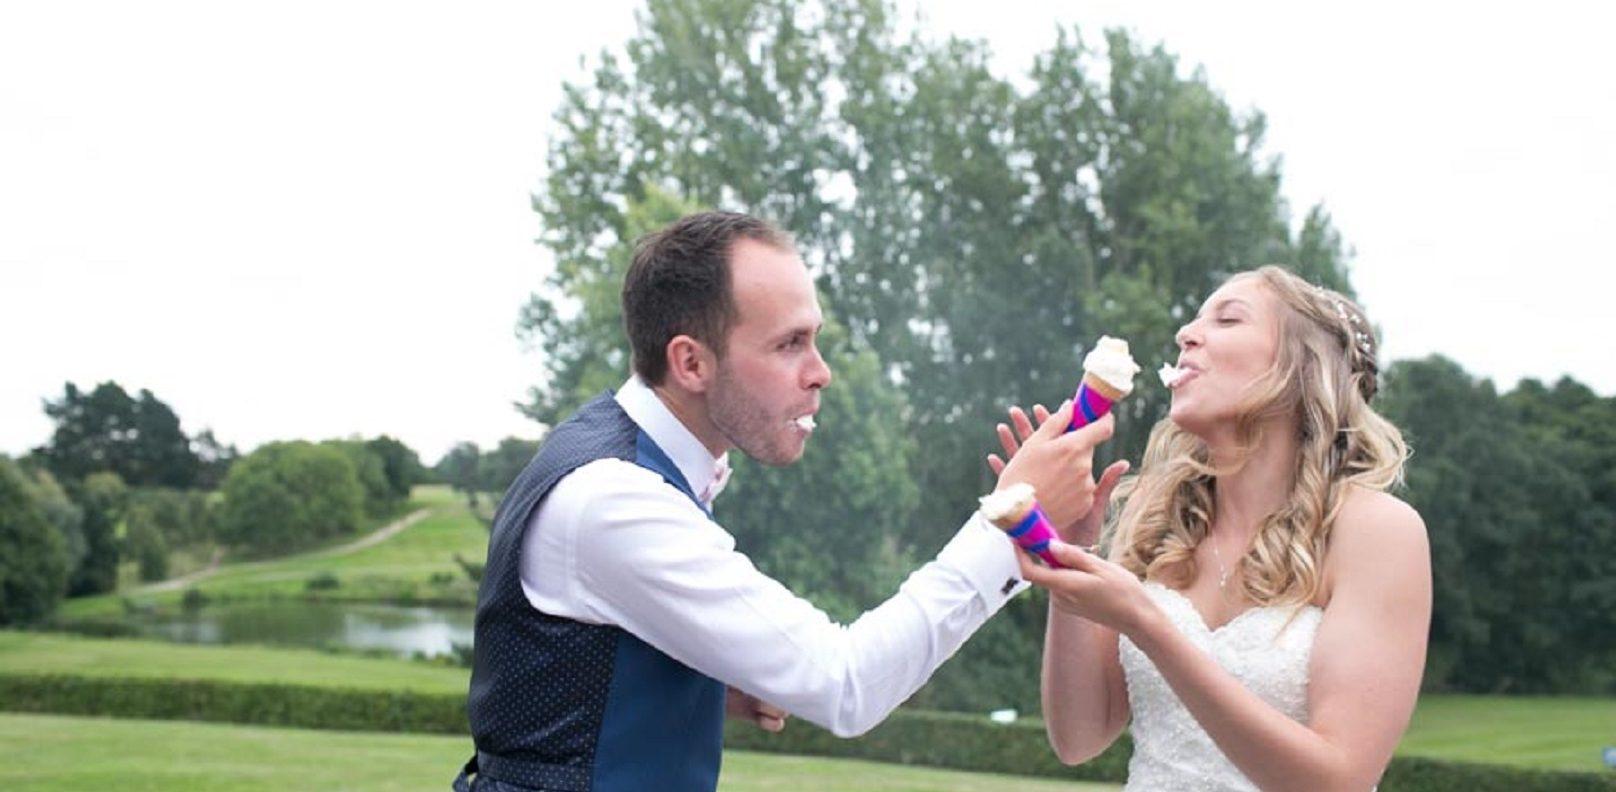 stoke by nayland wedding photography